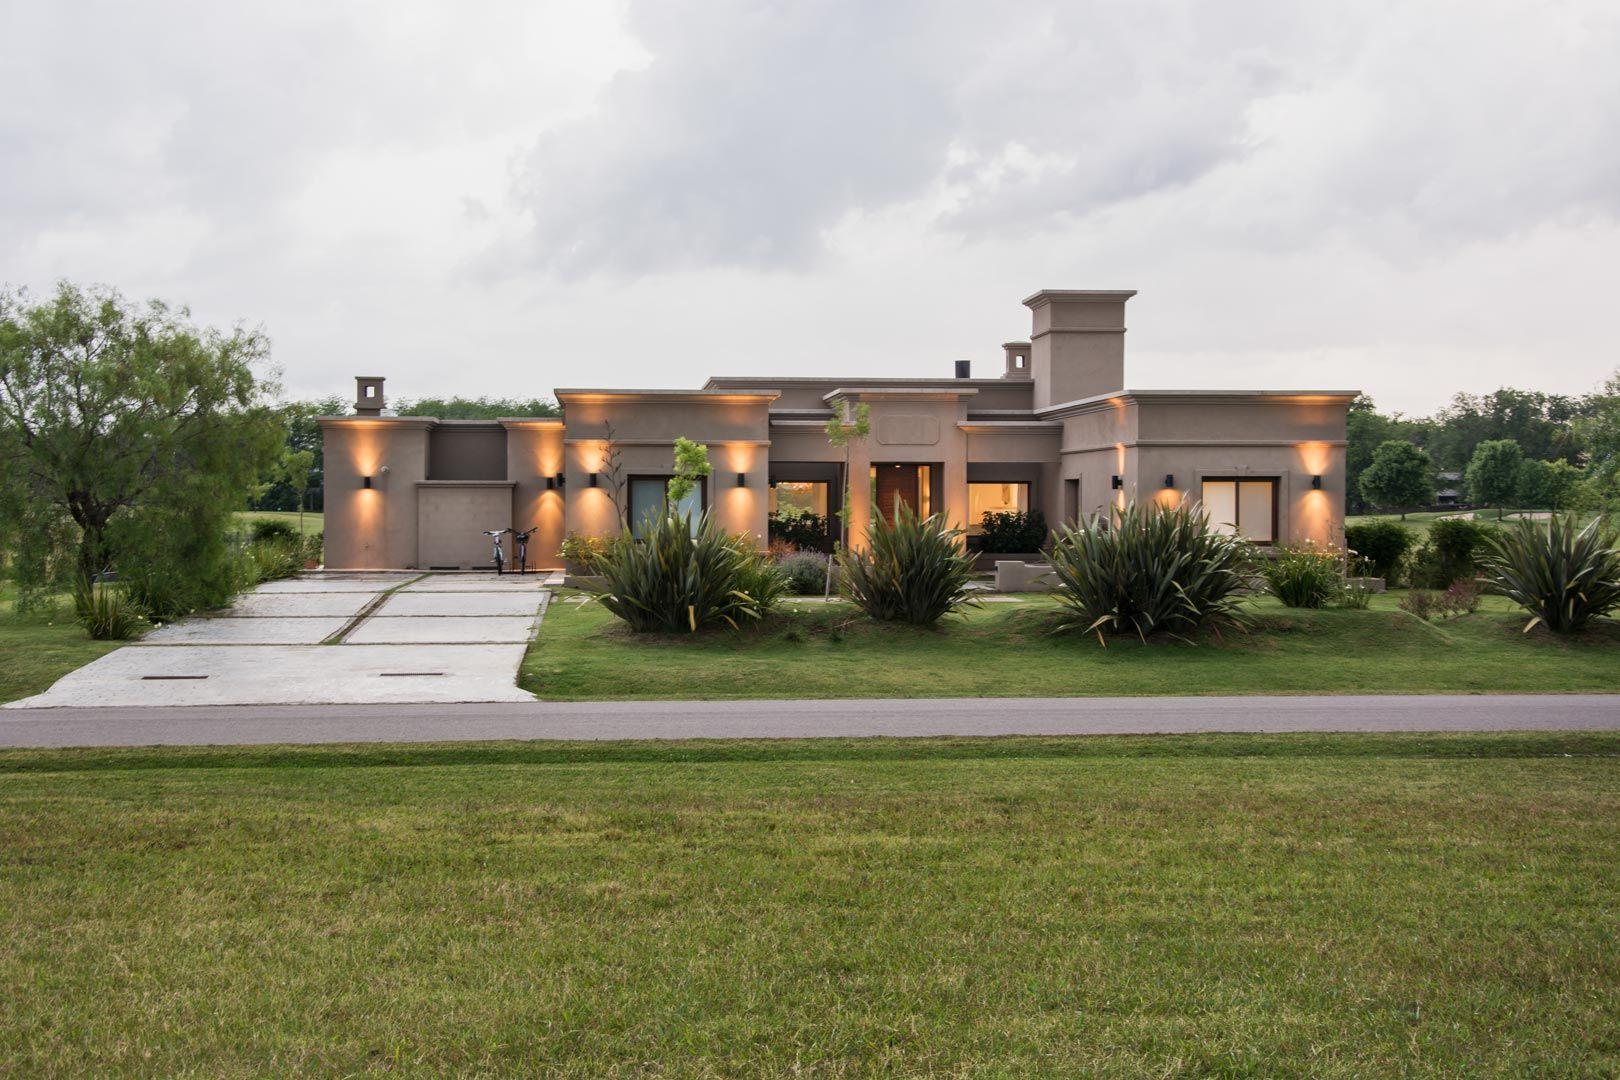 Galeria fotos clari clari arquitectos casa estancias for Portal de arquitectos casa de campo